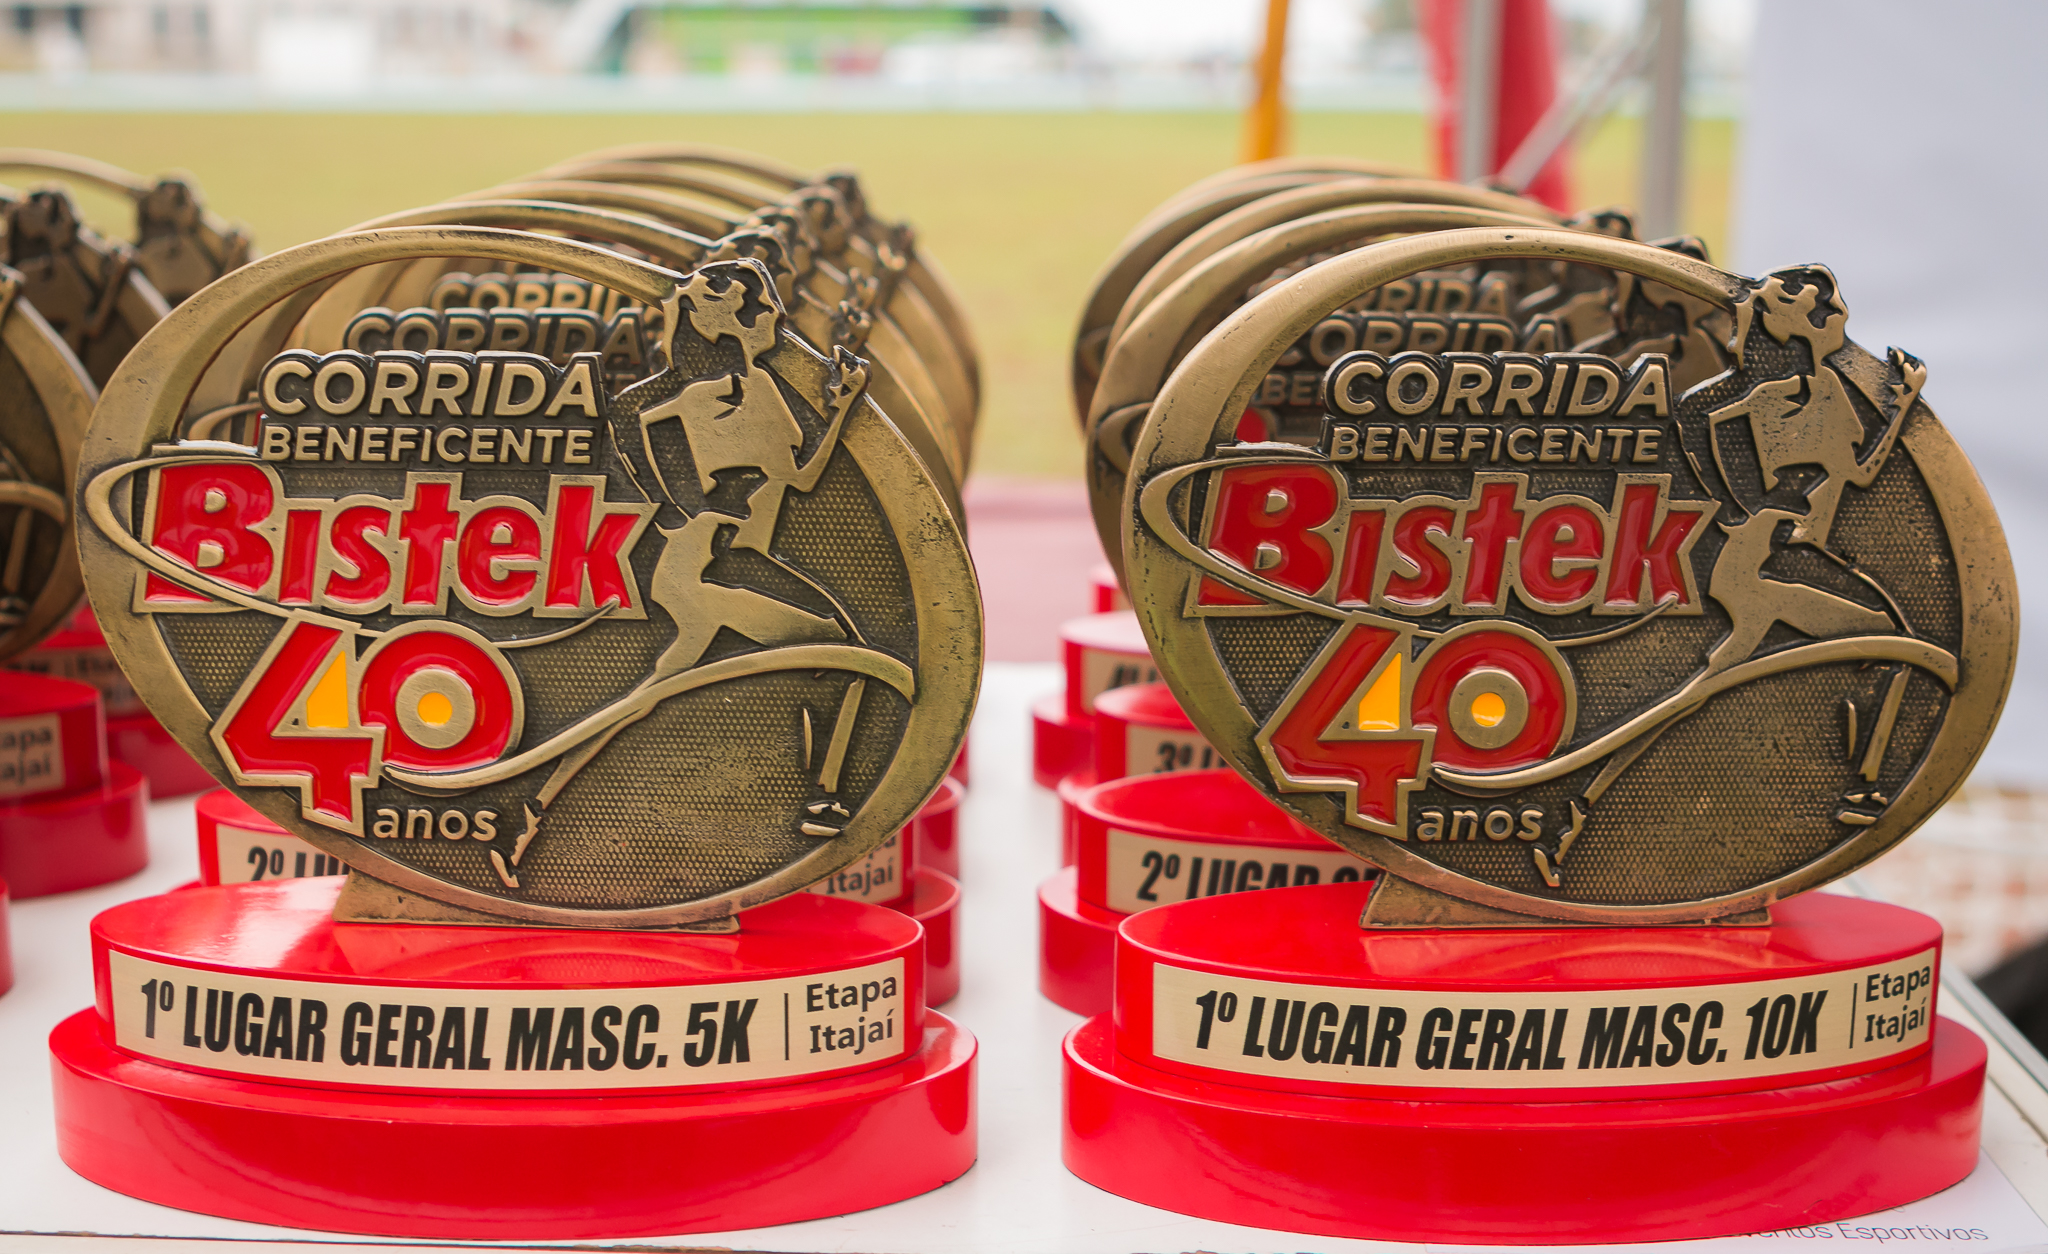 Bistek promove corrida beneficente em Nova Veneza